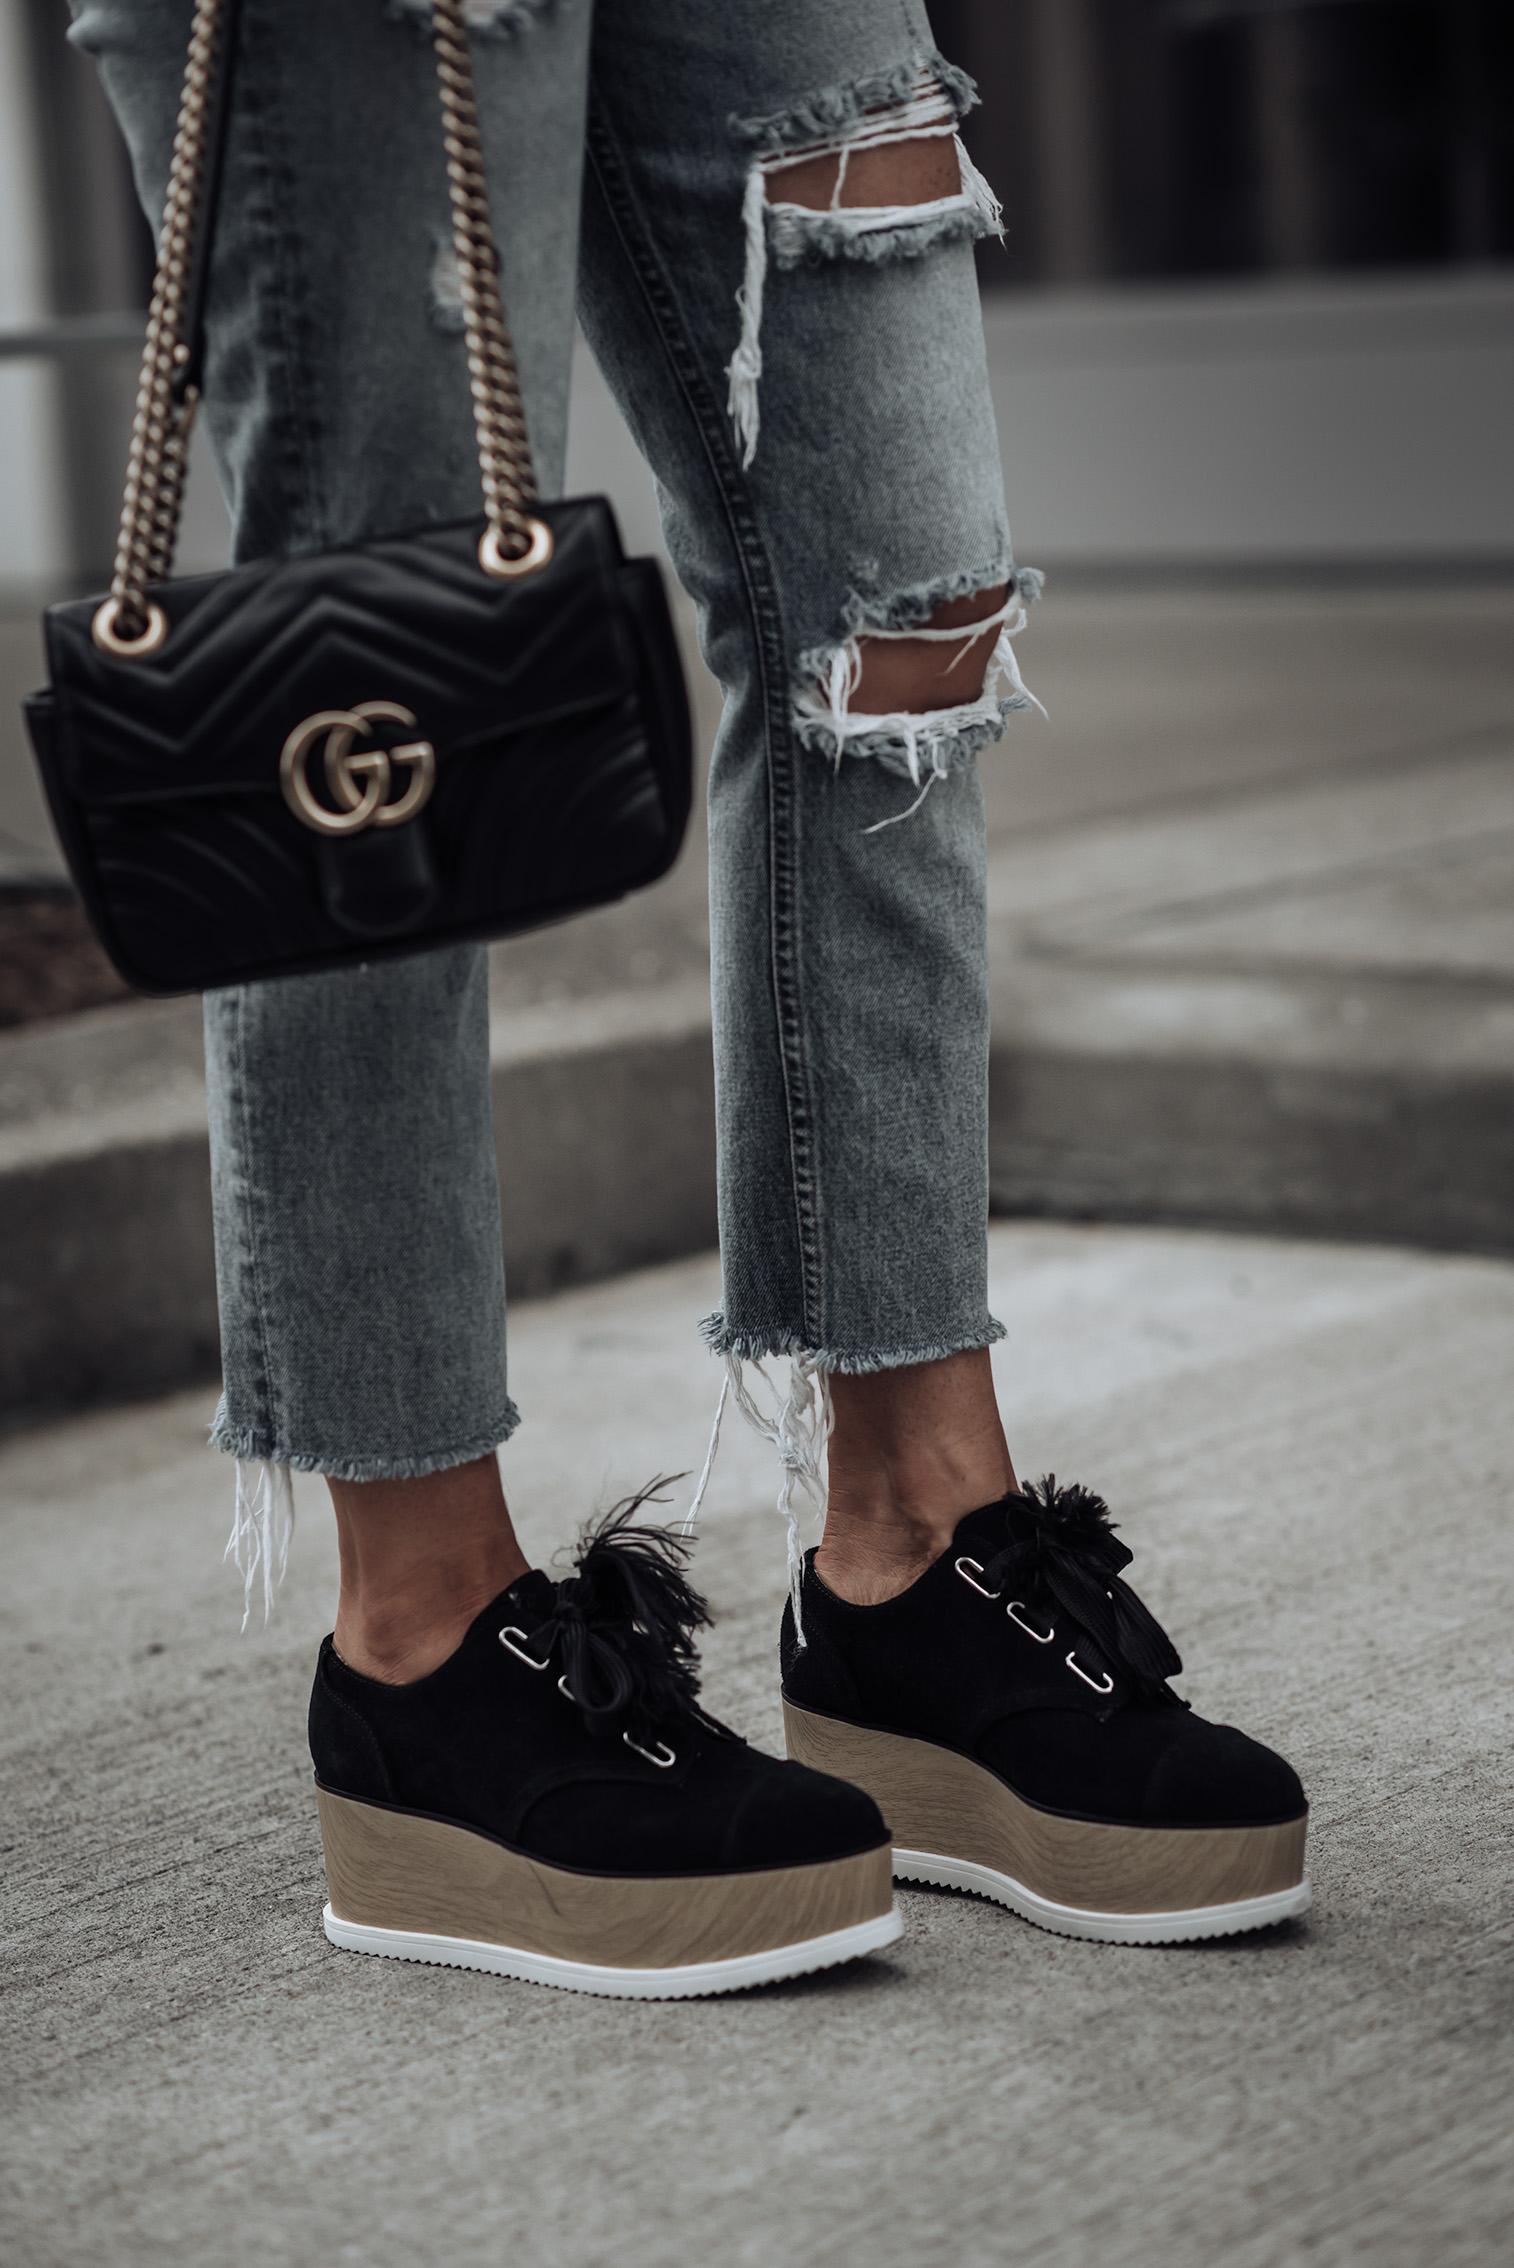 Leopard Beret | ASOS Corset Top | Suede Platform Shoes | Ripped Denim | #platformshoes #gucci #liketkit #streetstyle